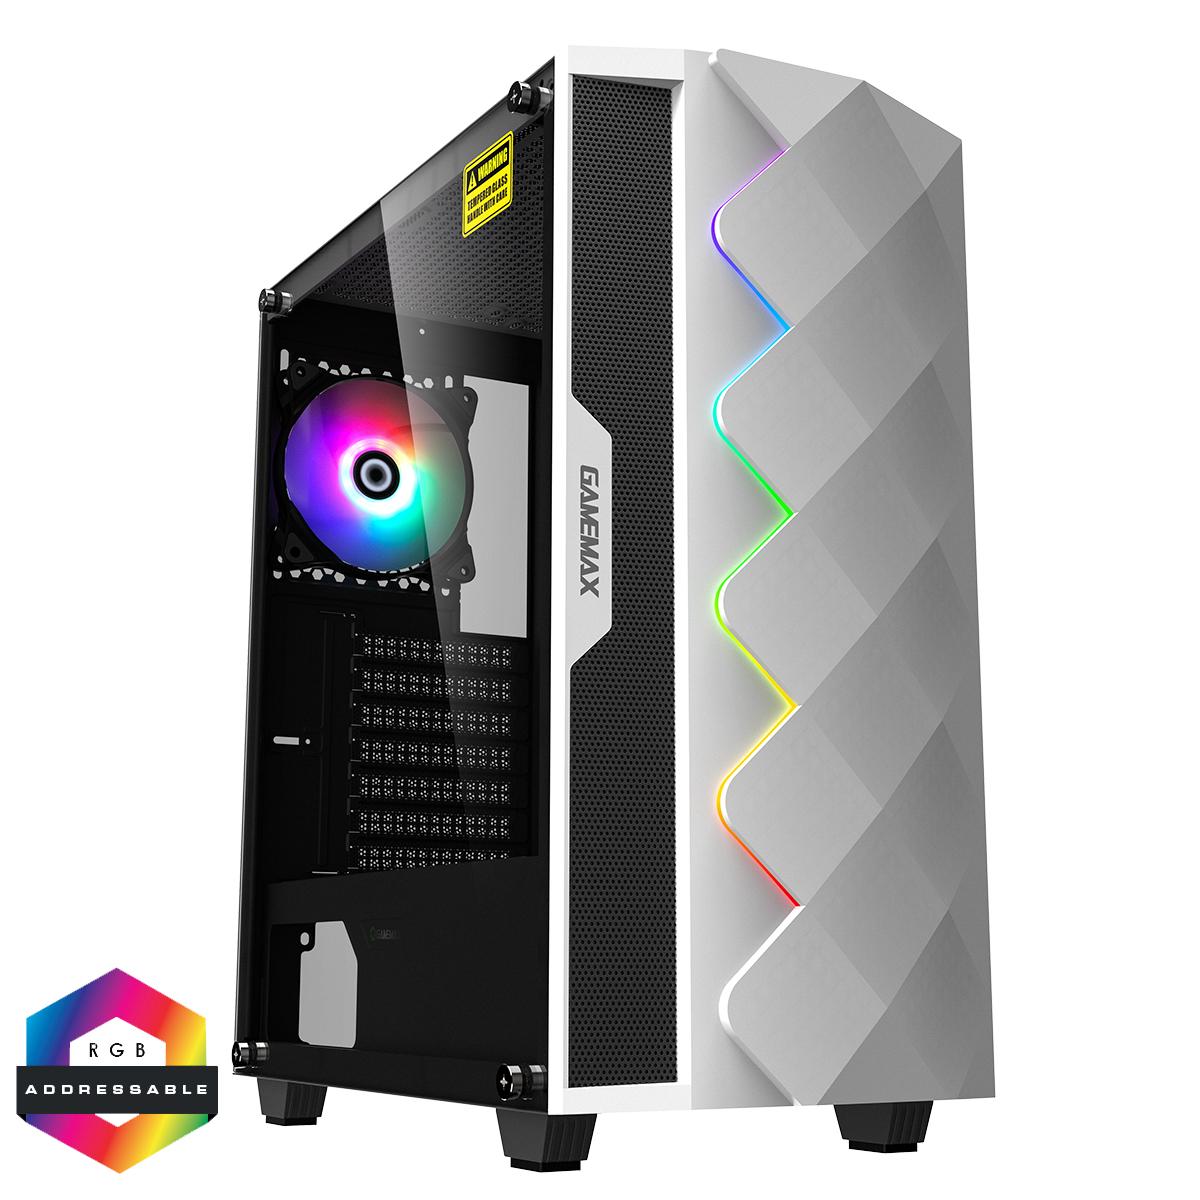 GAMEMAX Diamond White ARGB Gaming Case 1 x ARGB Fan 1 x ARGB LED Strip